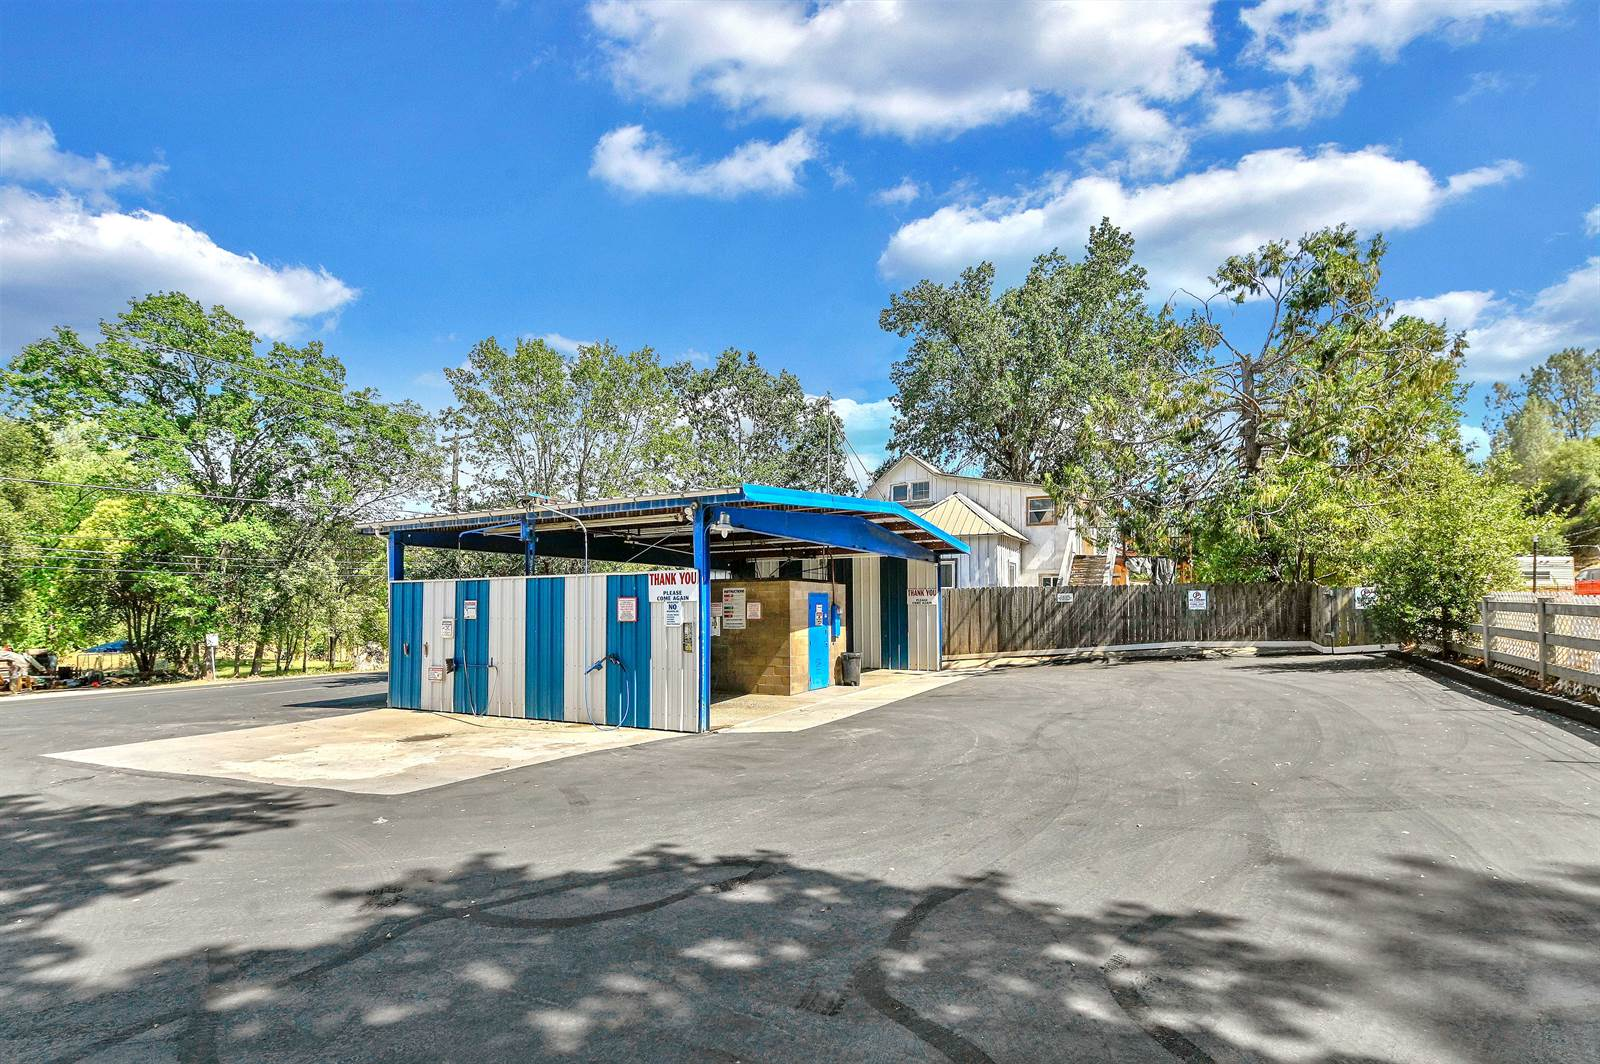 1810 South S Main St Street, Angels Camp, CA 95222